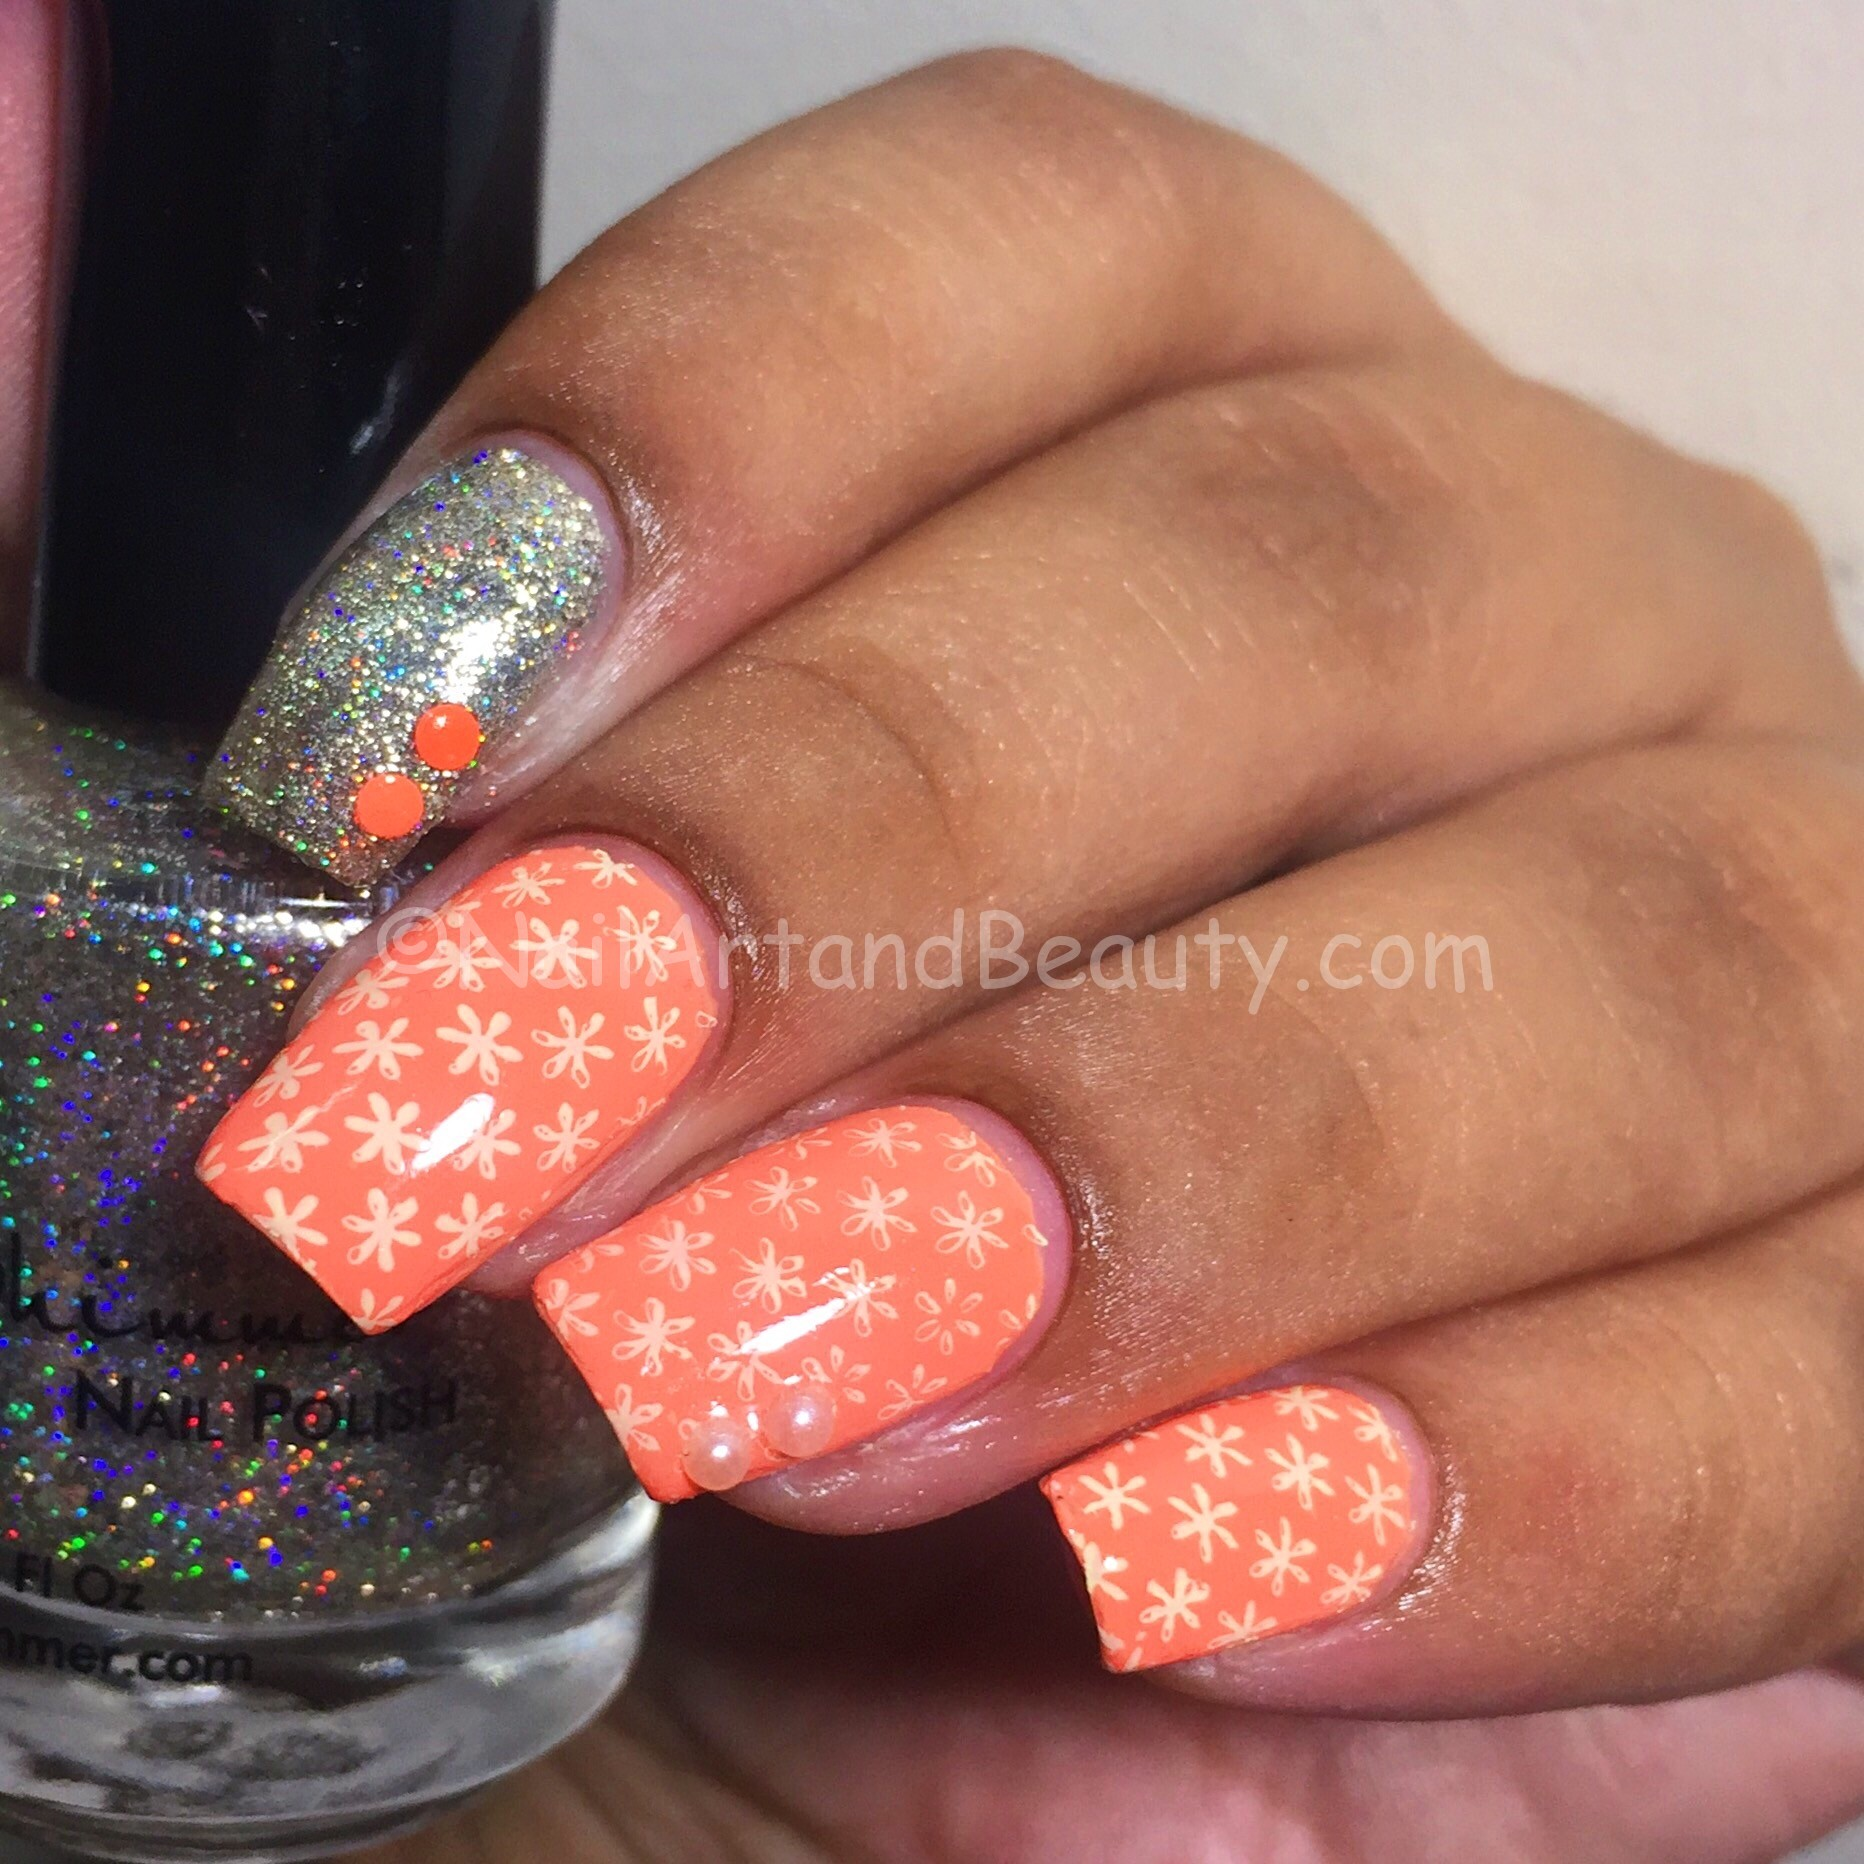 Tangy Peach Nails